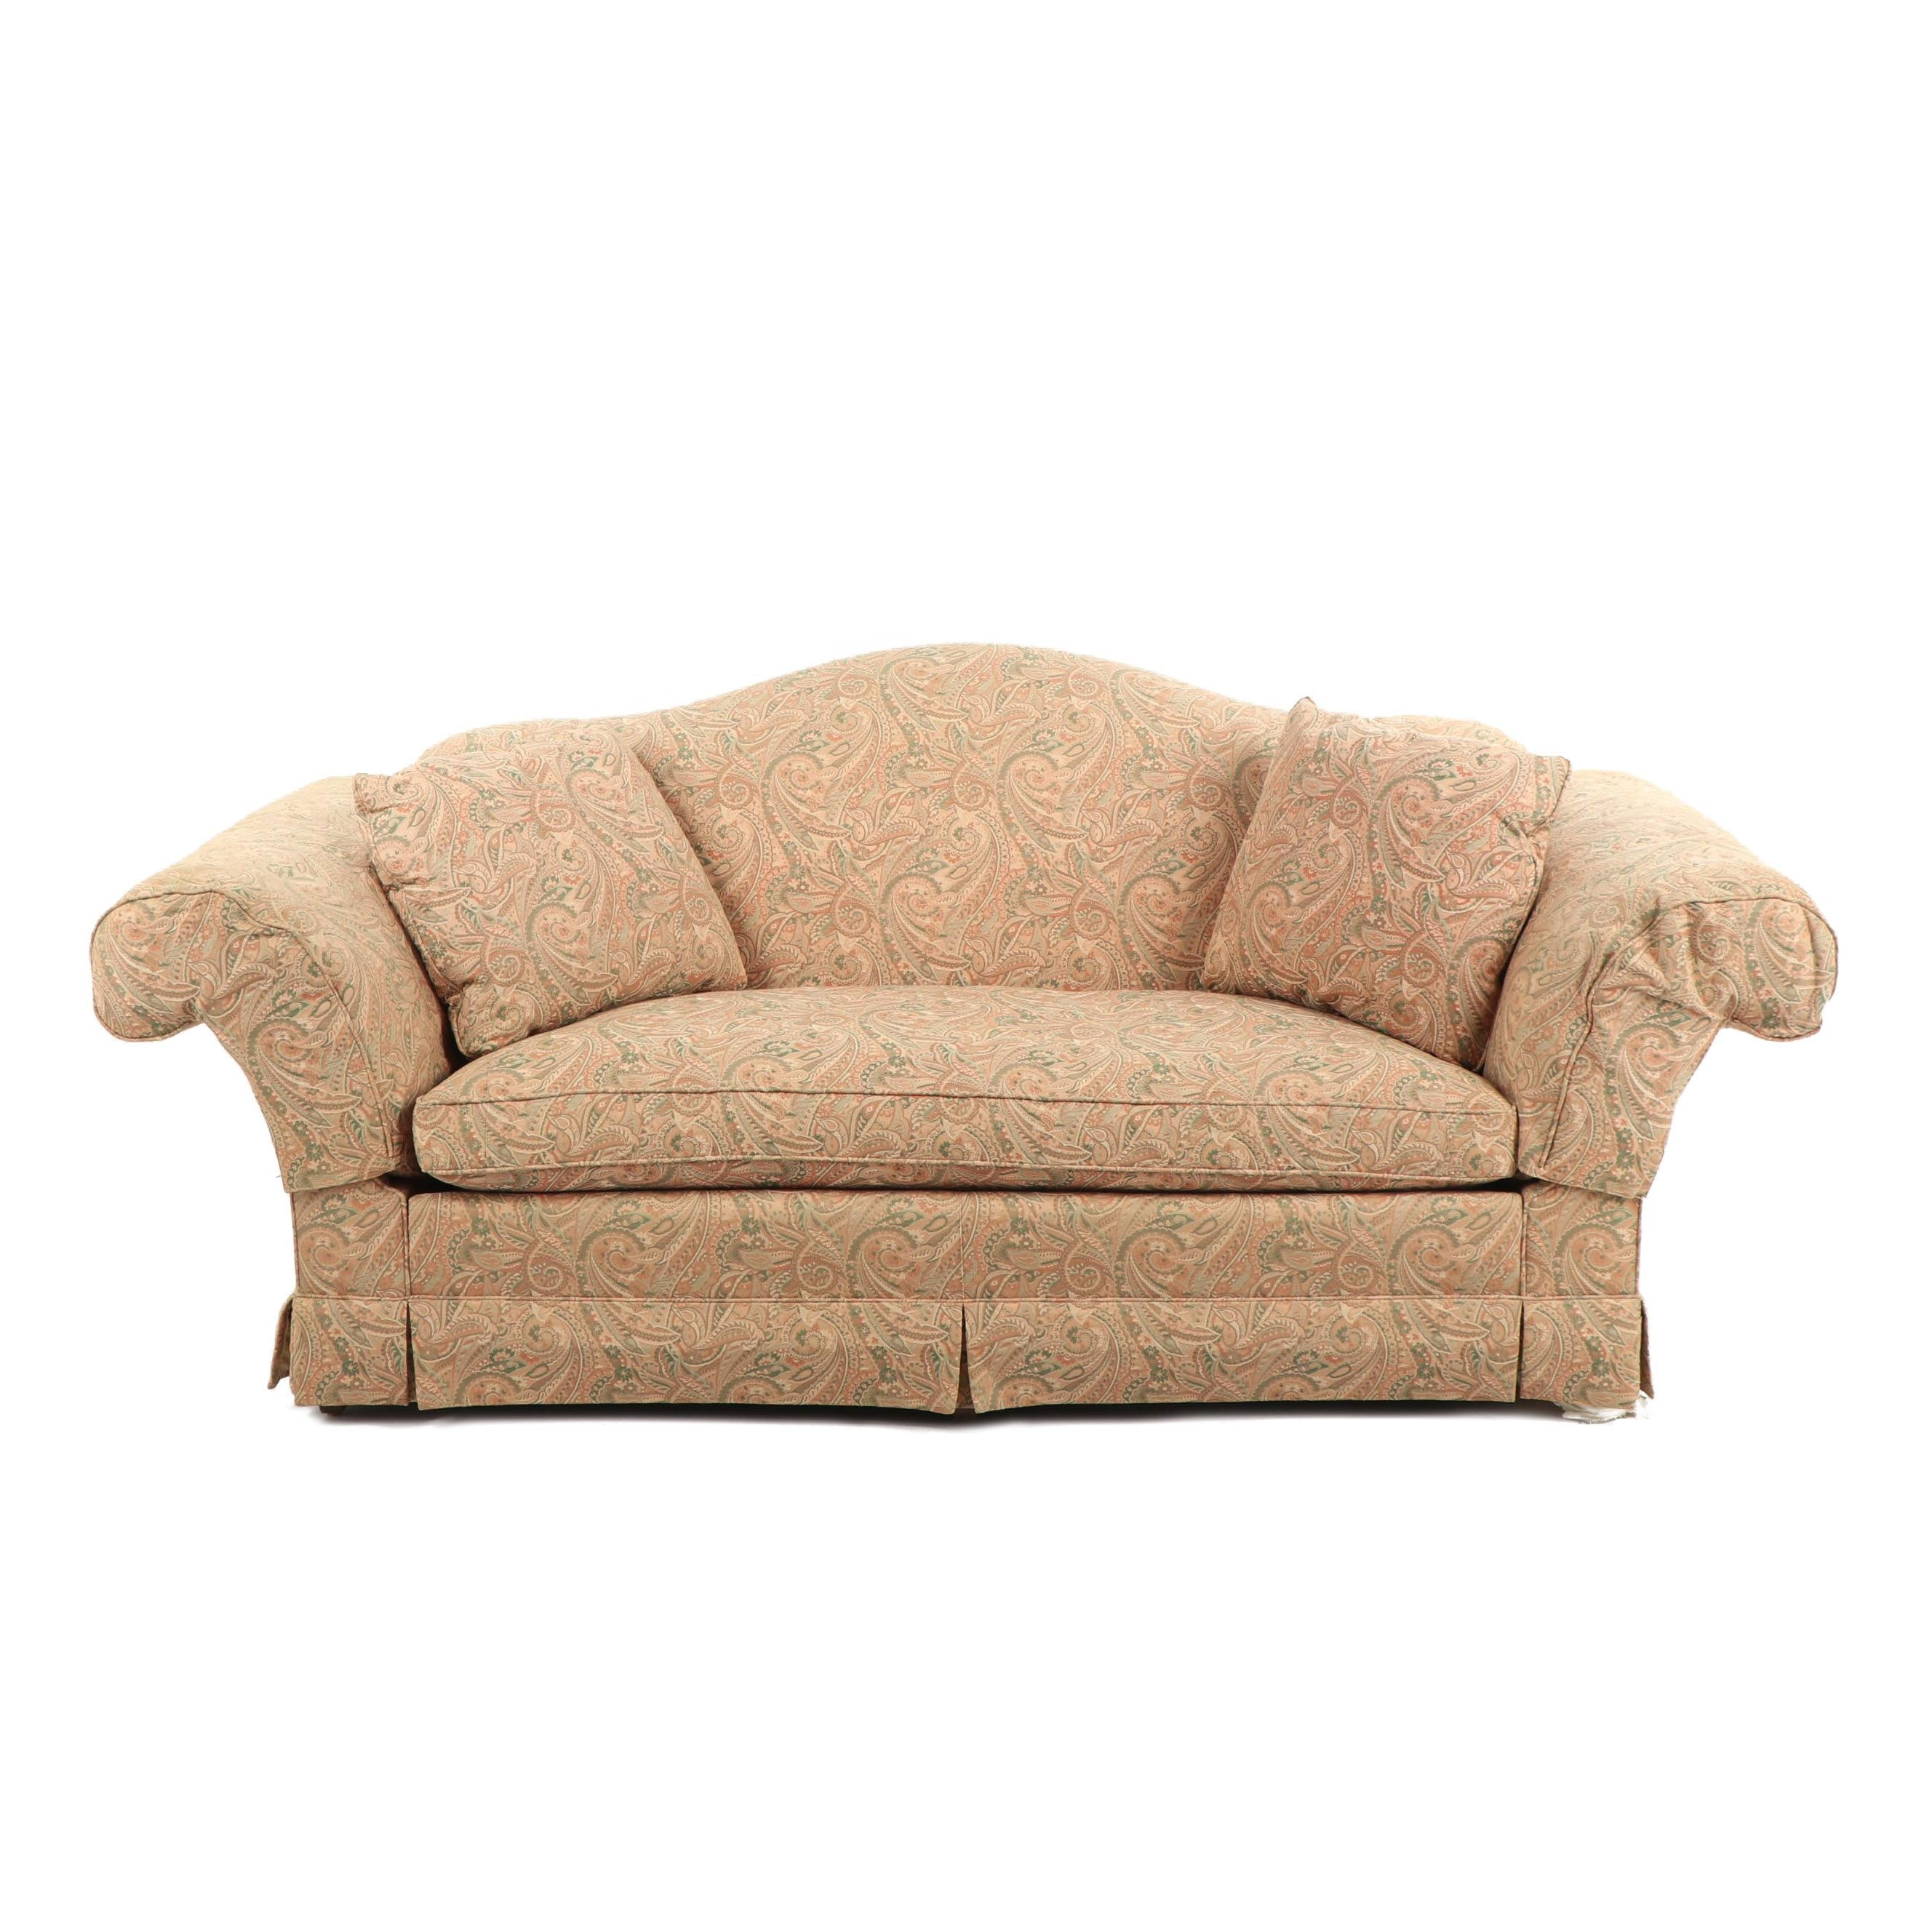 Camel Back Paisley Sofa By Baker ...